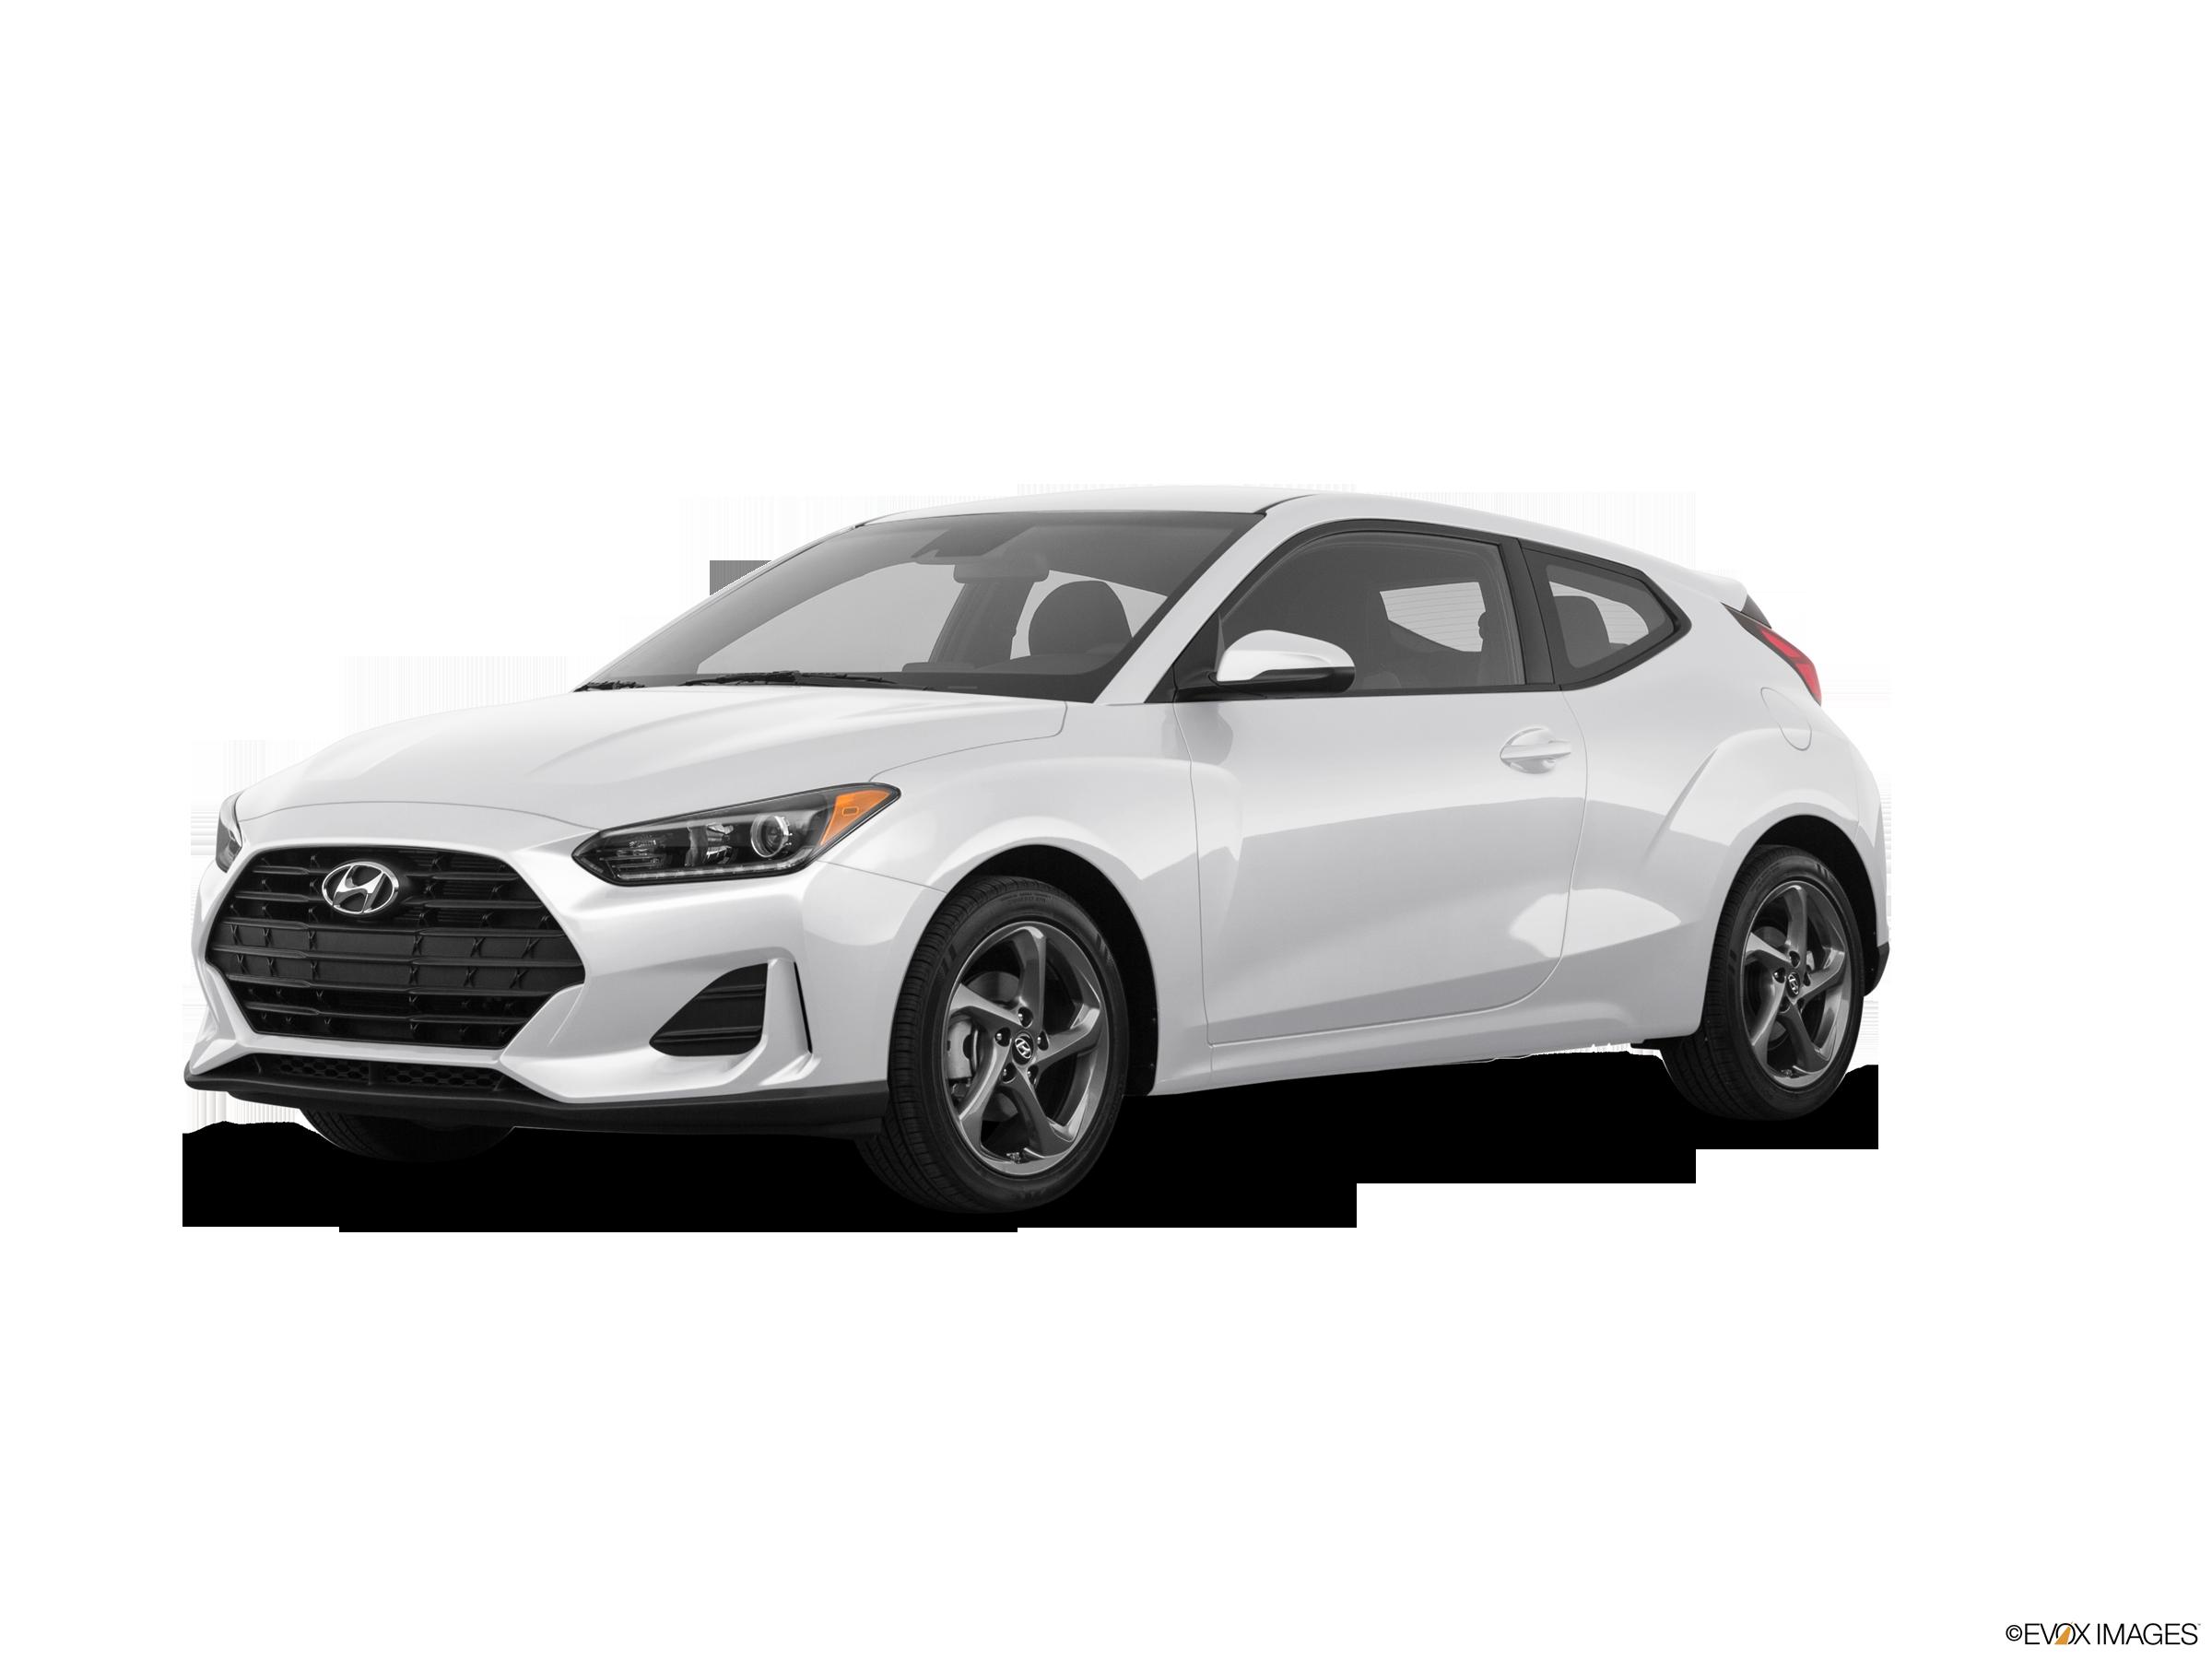 Hyundai Coupe Models | Kelley Blue Book | Hyundai Two Door Car |  | Kelley Blue Book